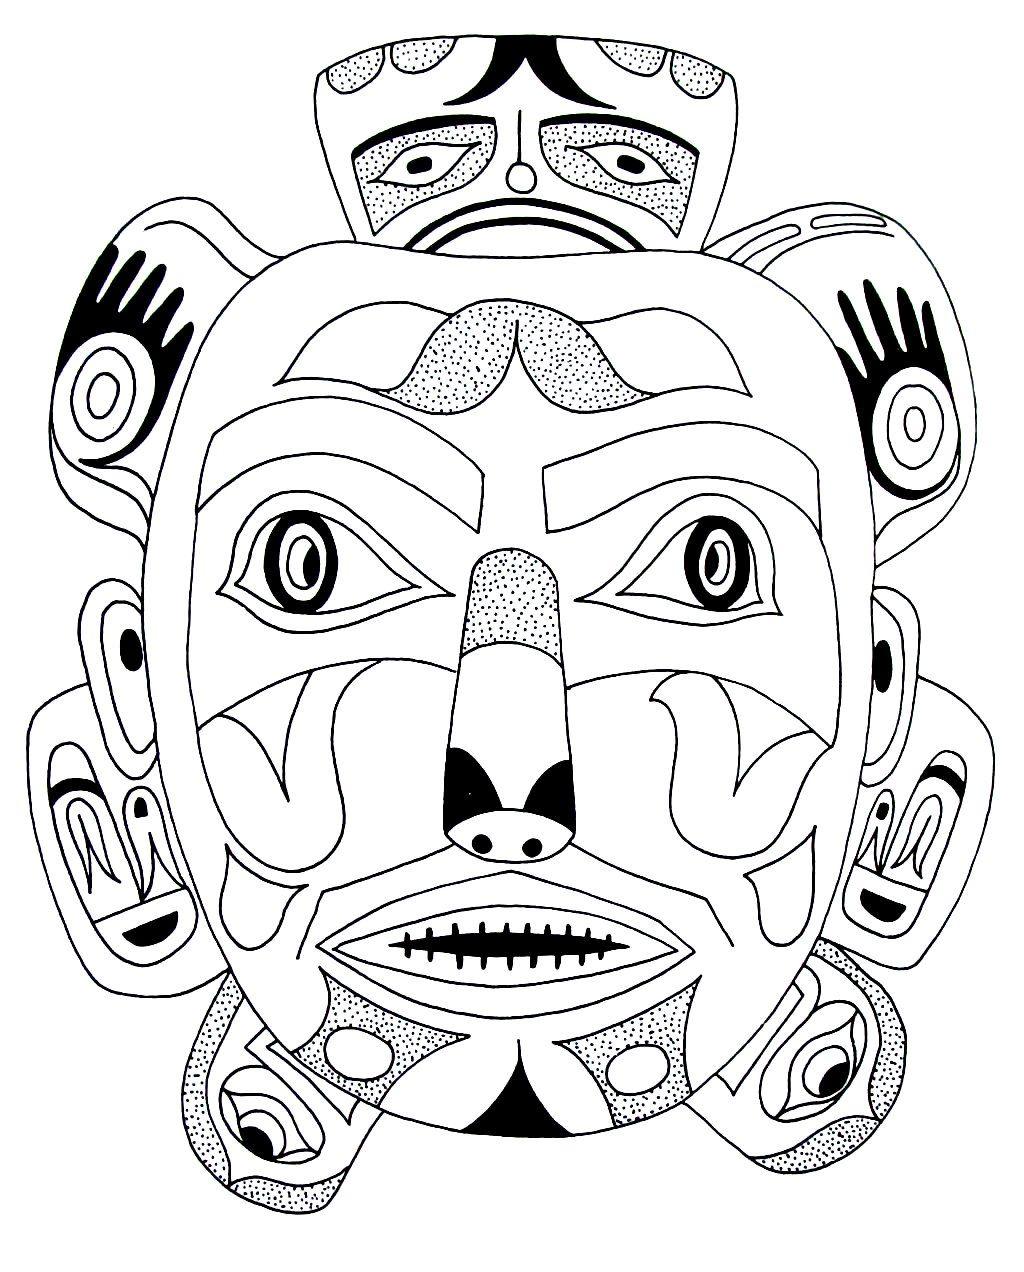 North American Indian Design Coloring Book